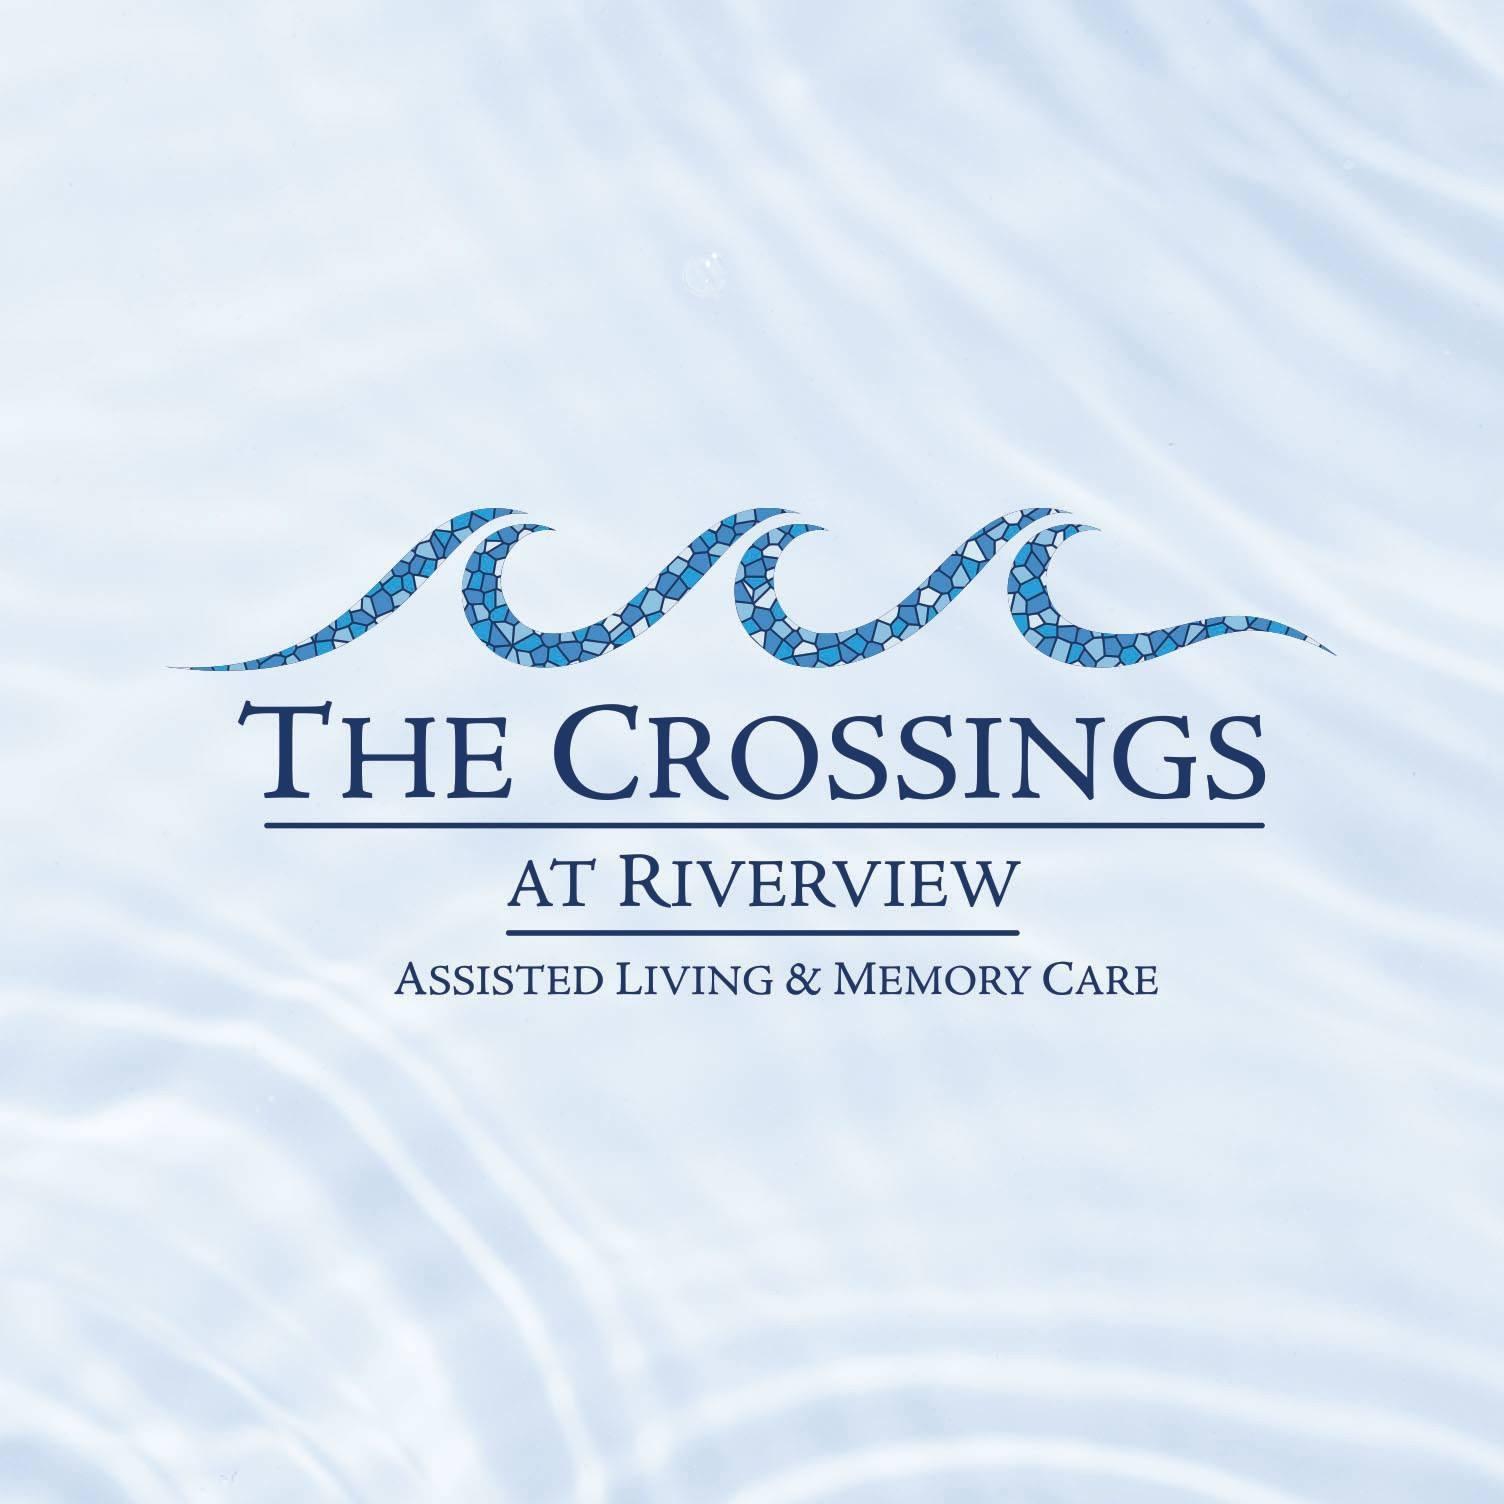 CrossingsRiverview logo